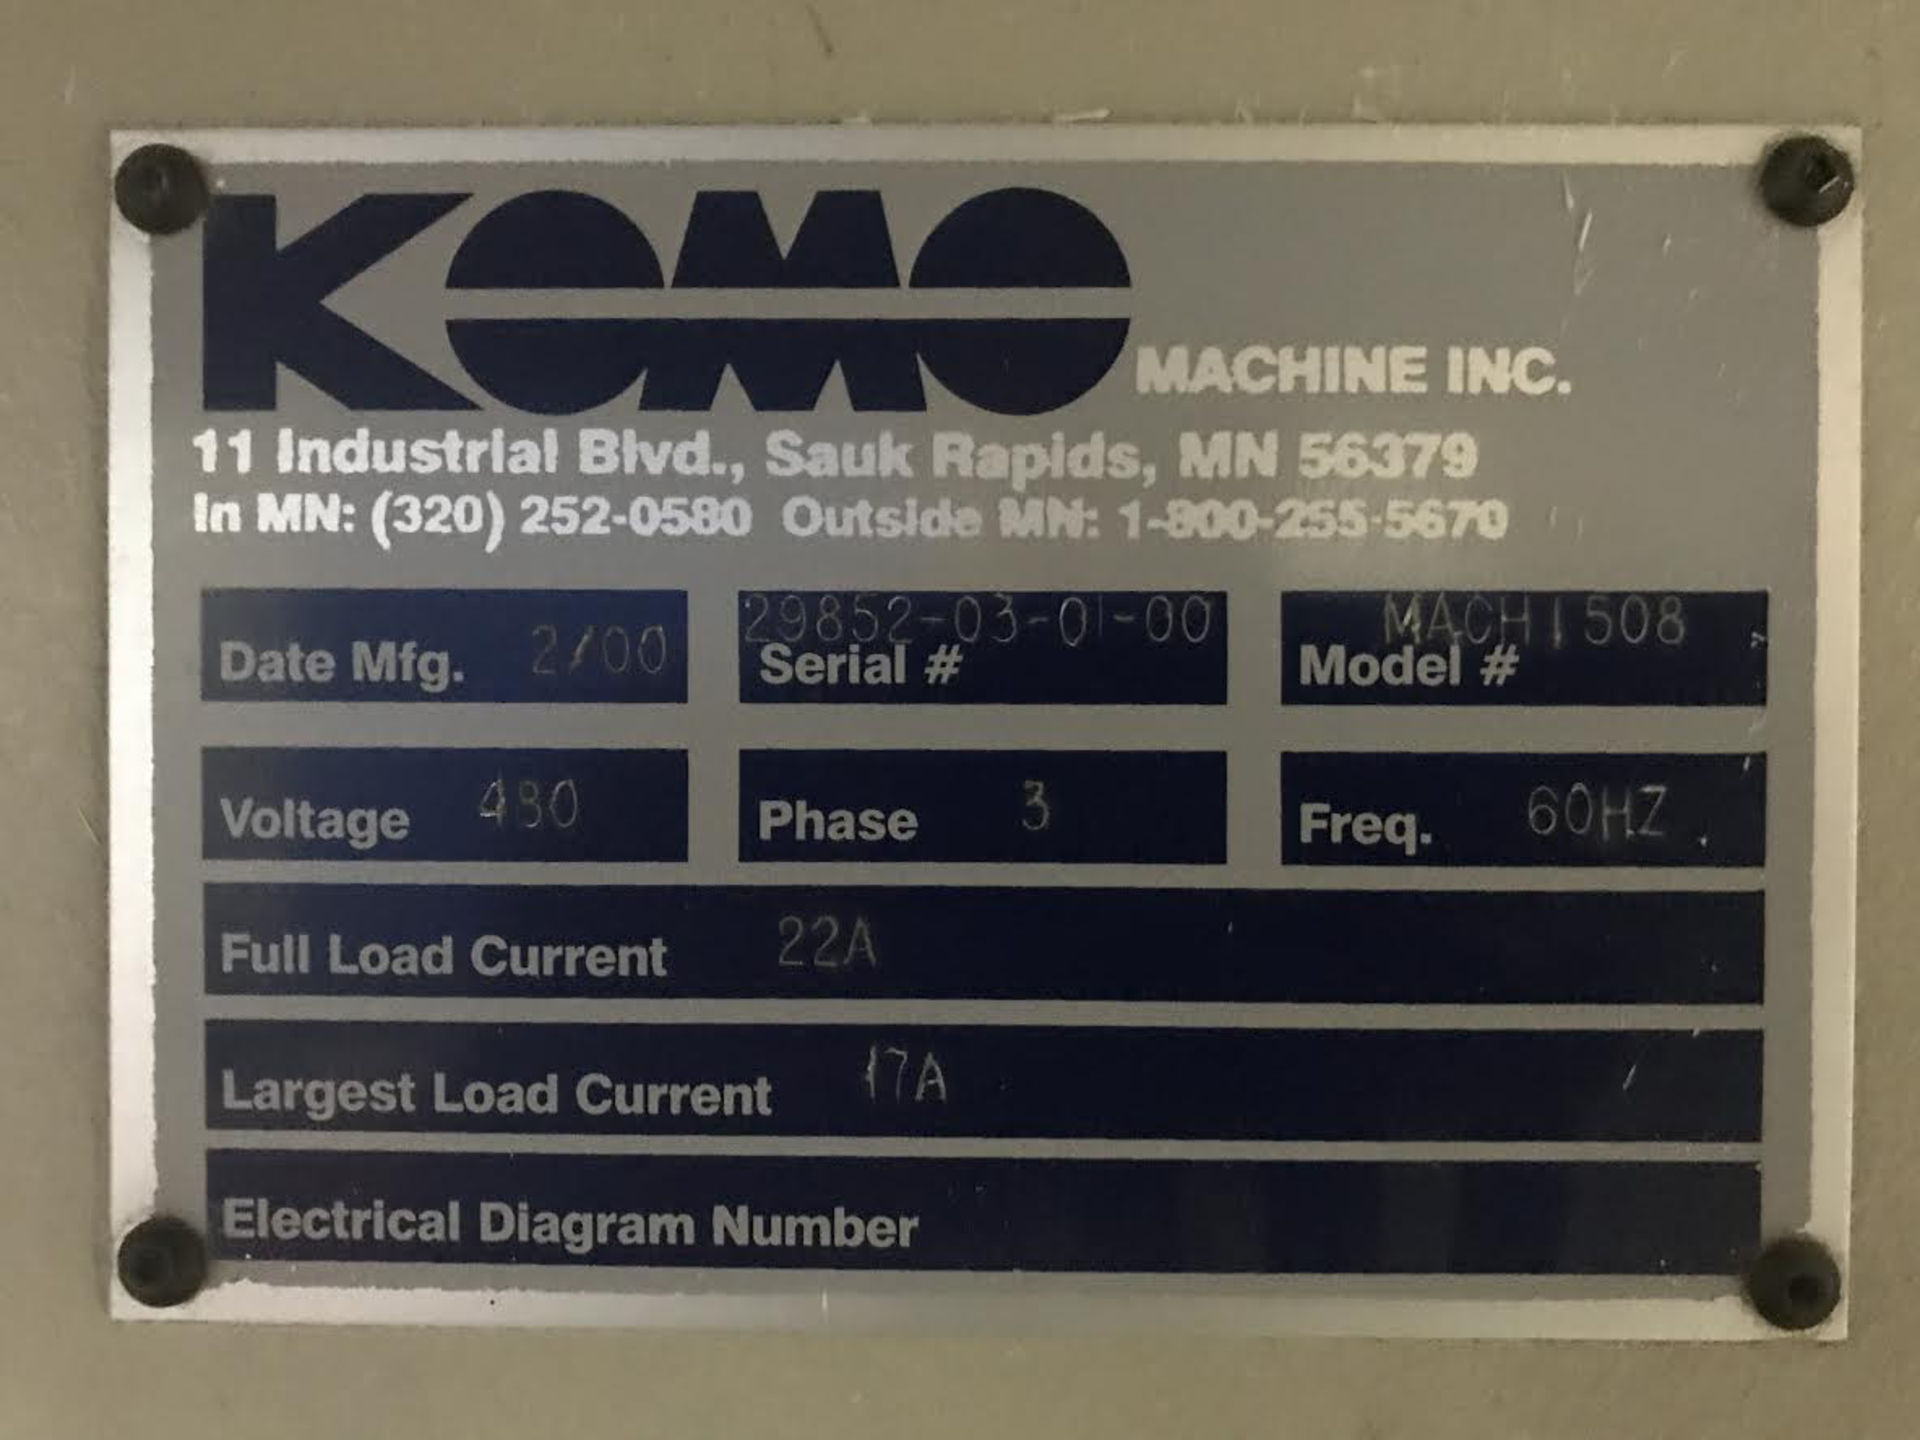 Lot 26 - Komo Mach 1508 CNC Router